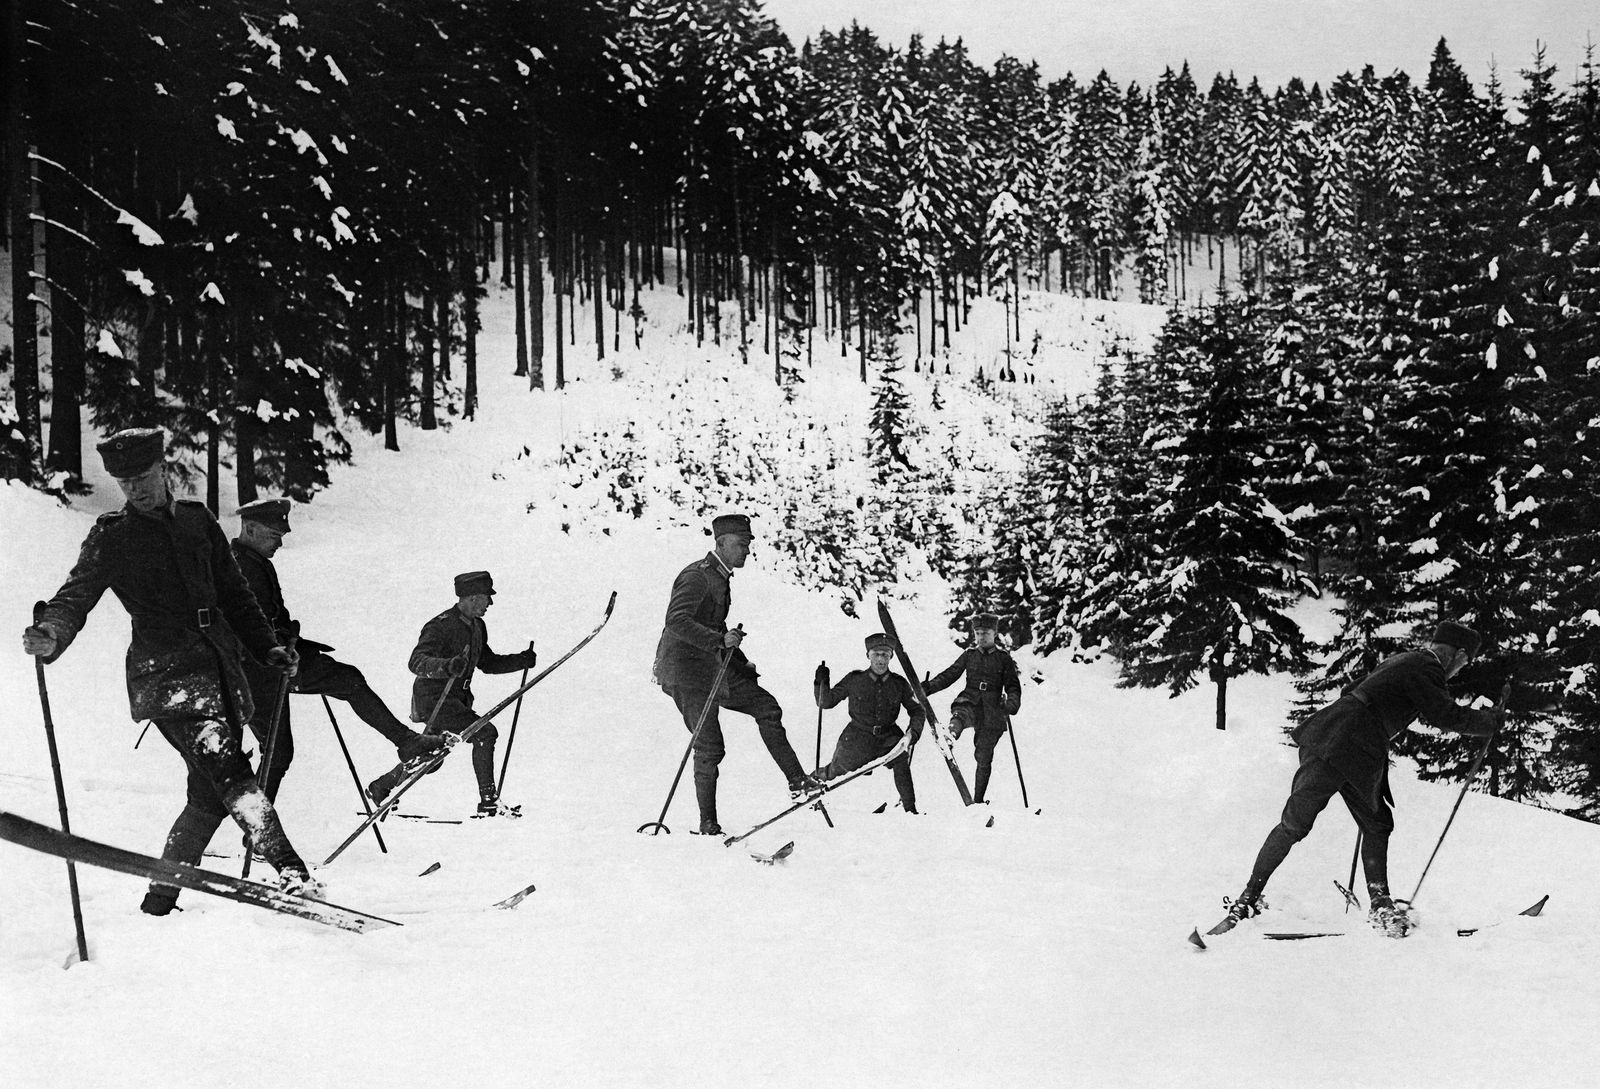 Skikurs für Militärangehörige, um 1930 © bpk / Kunstbibliothek, SMB / Willy Römer